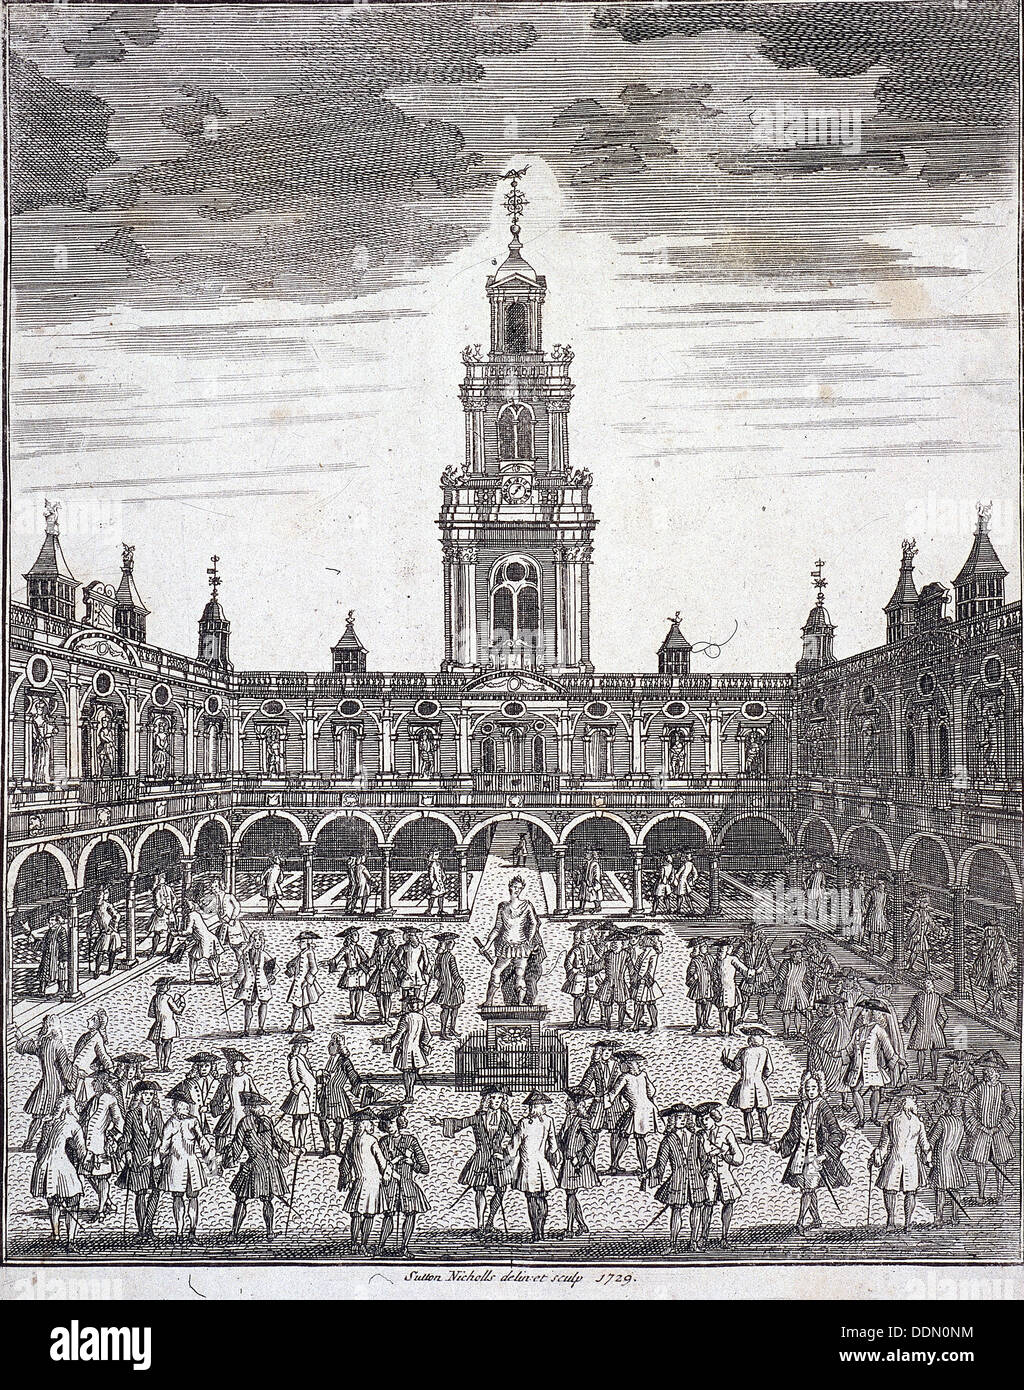 Courtyard of the Royal Exchange (2nd) London, 1729. Artist: Sutton Nicholls - Stock Image